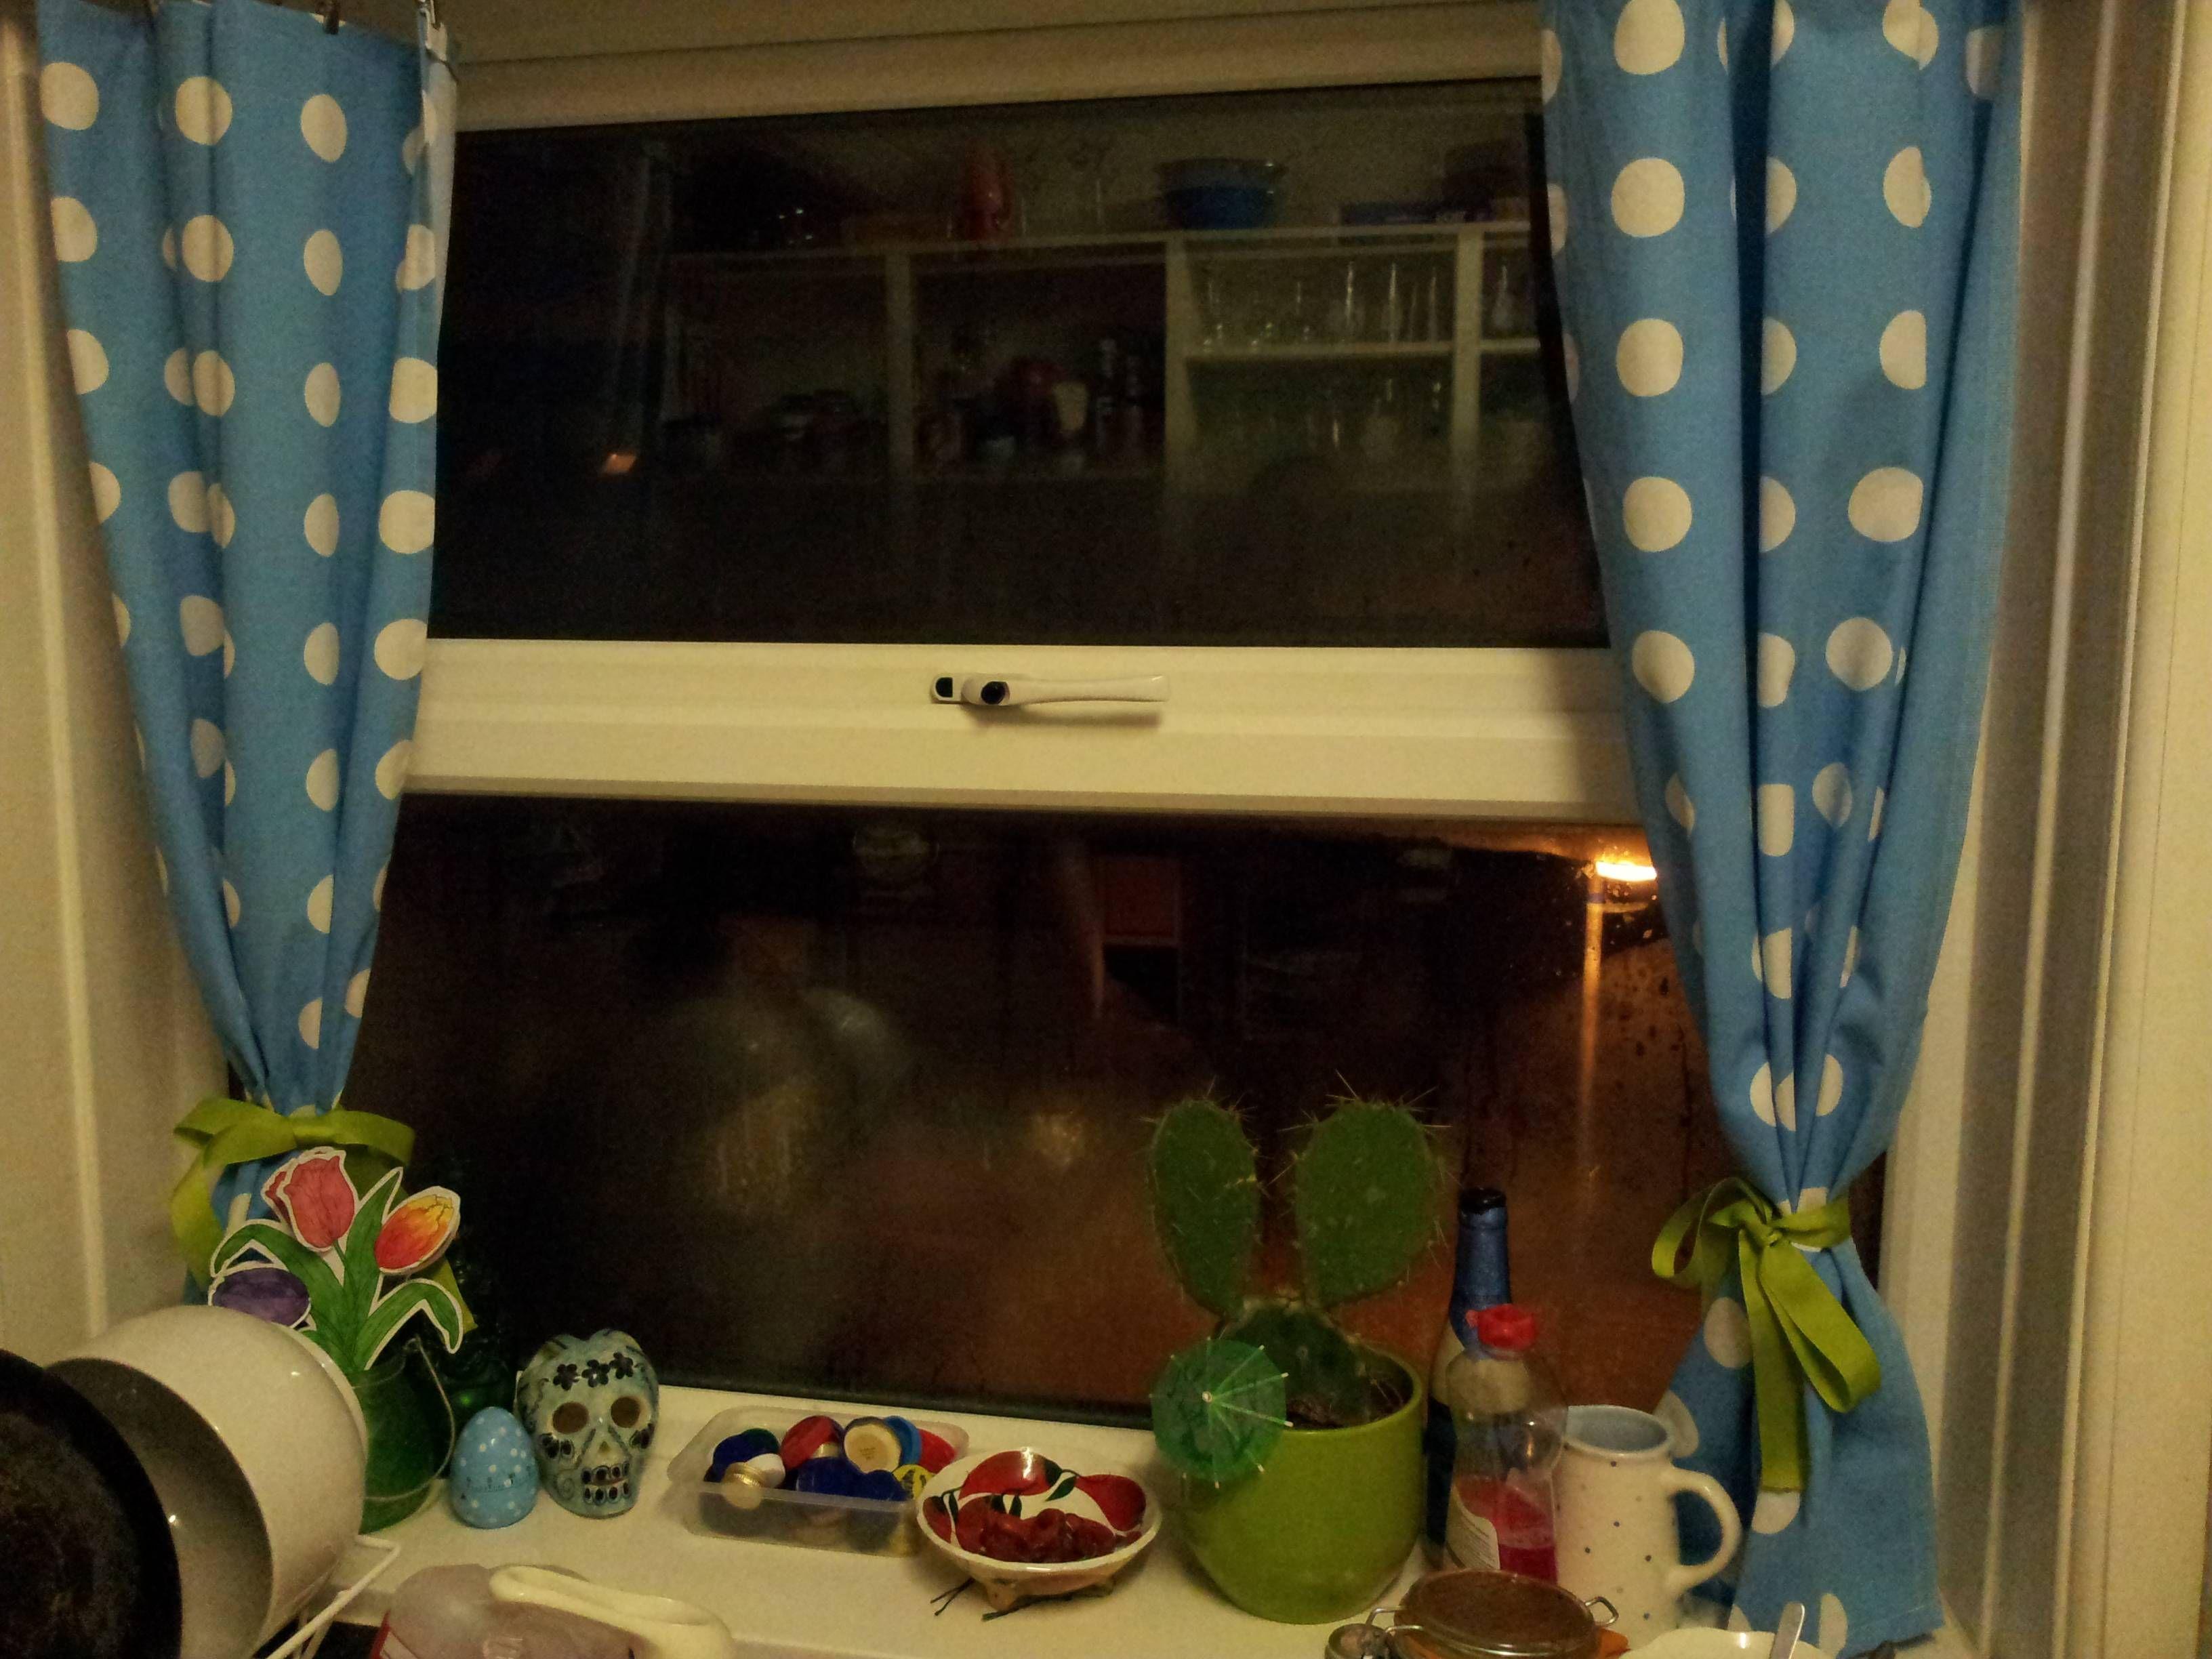 Spotty Kitchen Curtains | Home Design | Pinterest | Kitchen Curtains And  Kitchens